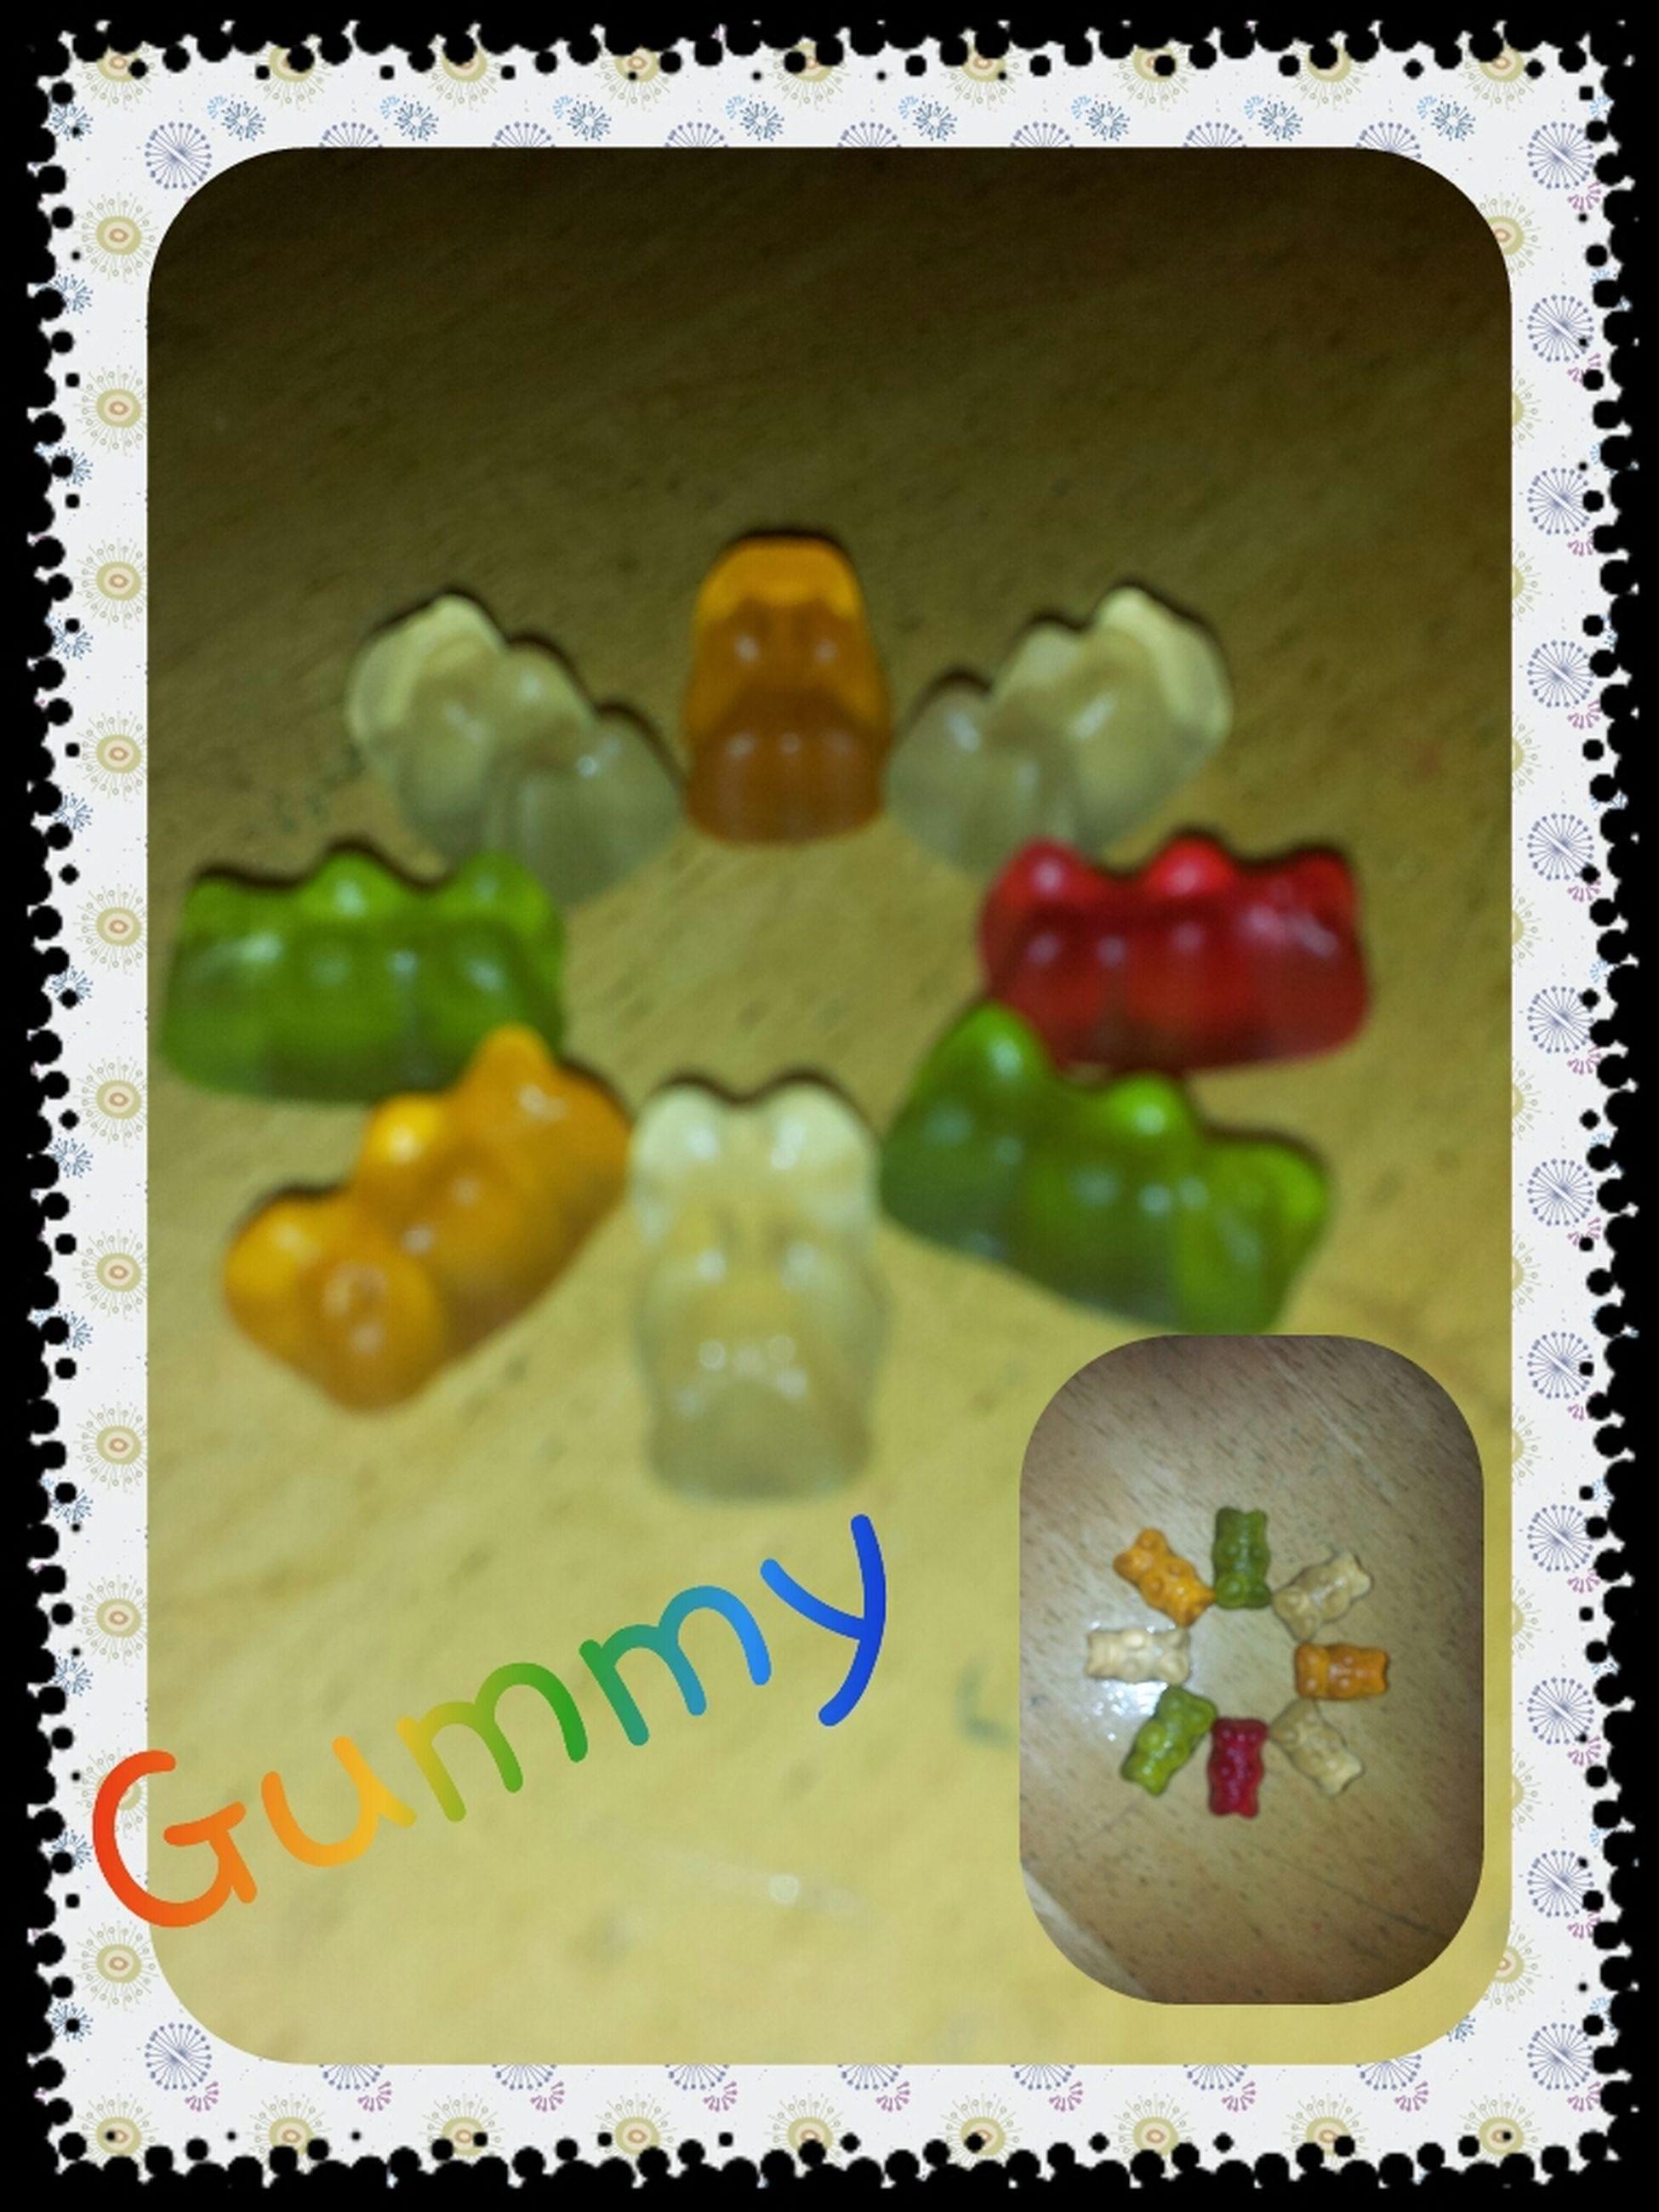 Yummy :) Sweets...